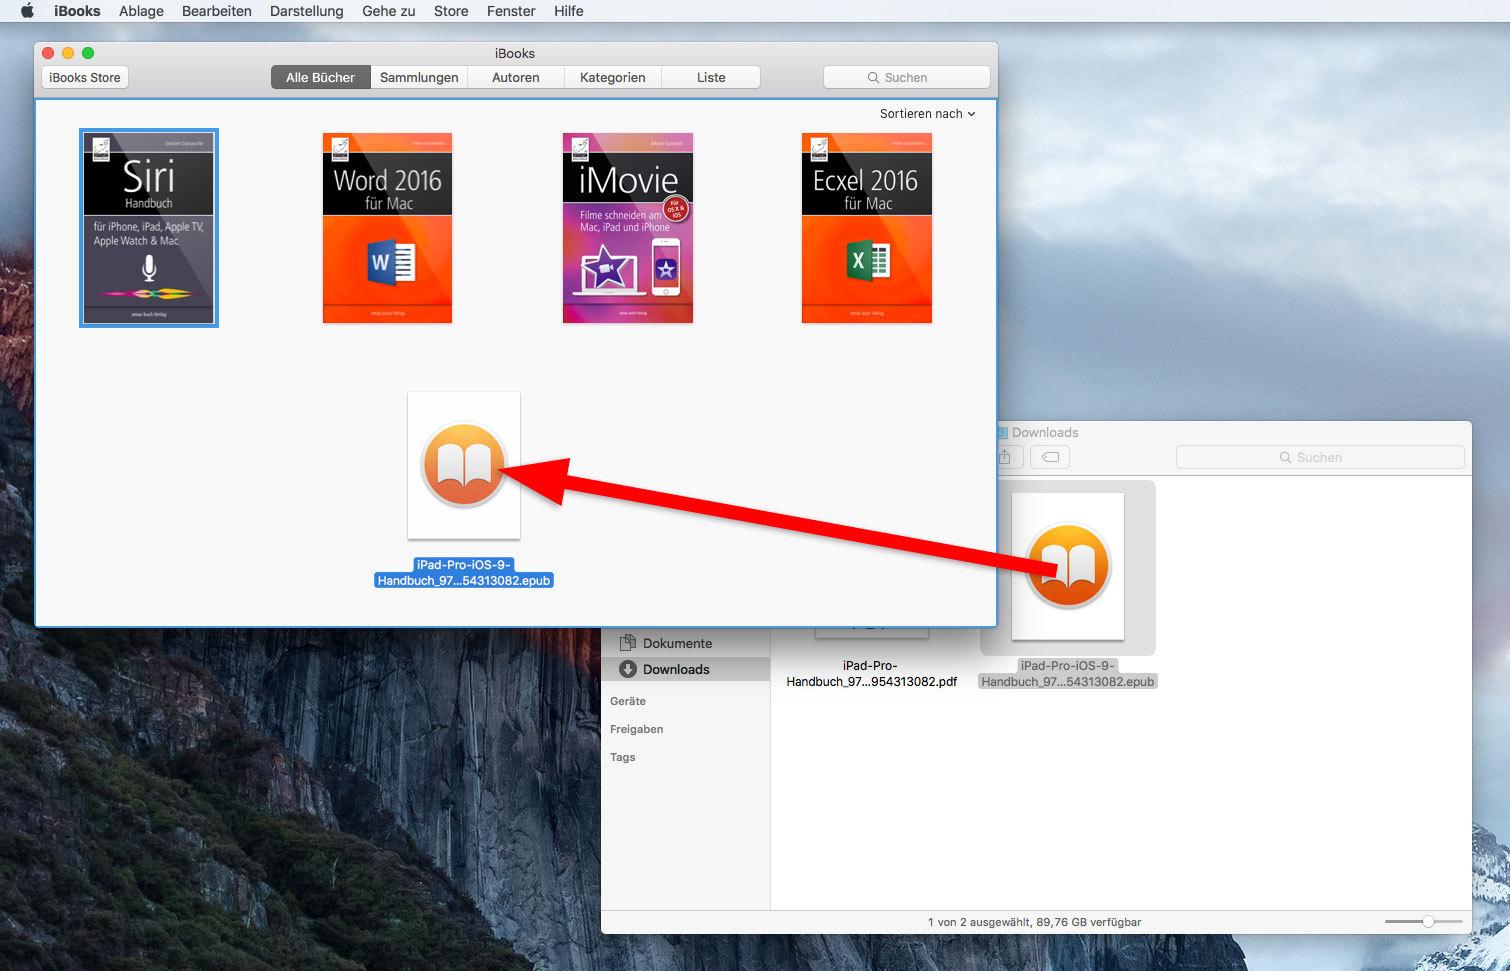 E-Book in iBooks hinzufügen